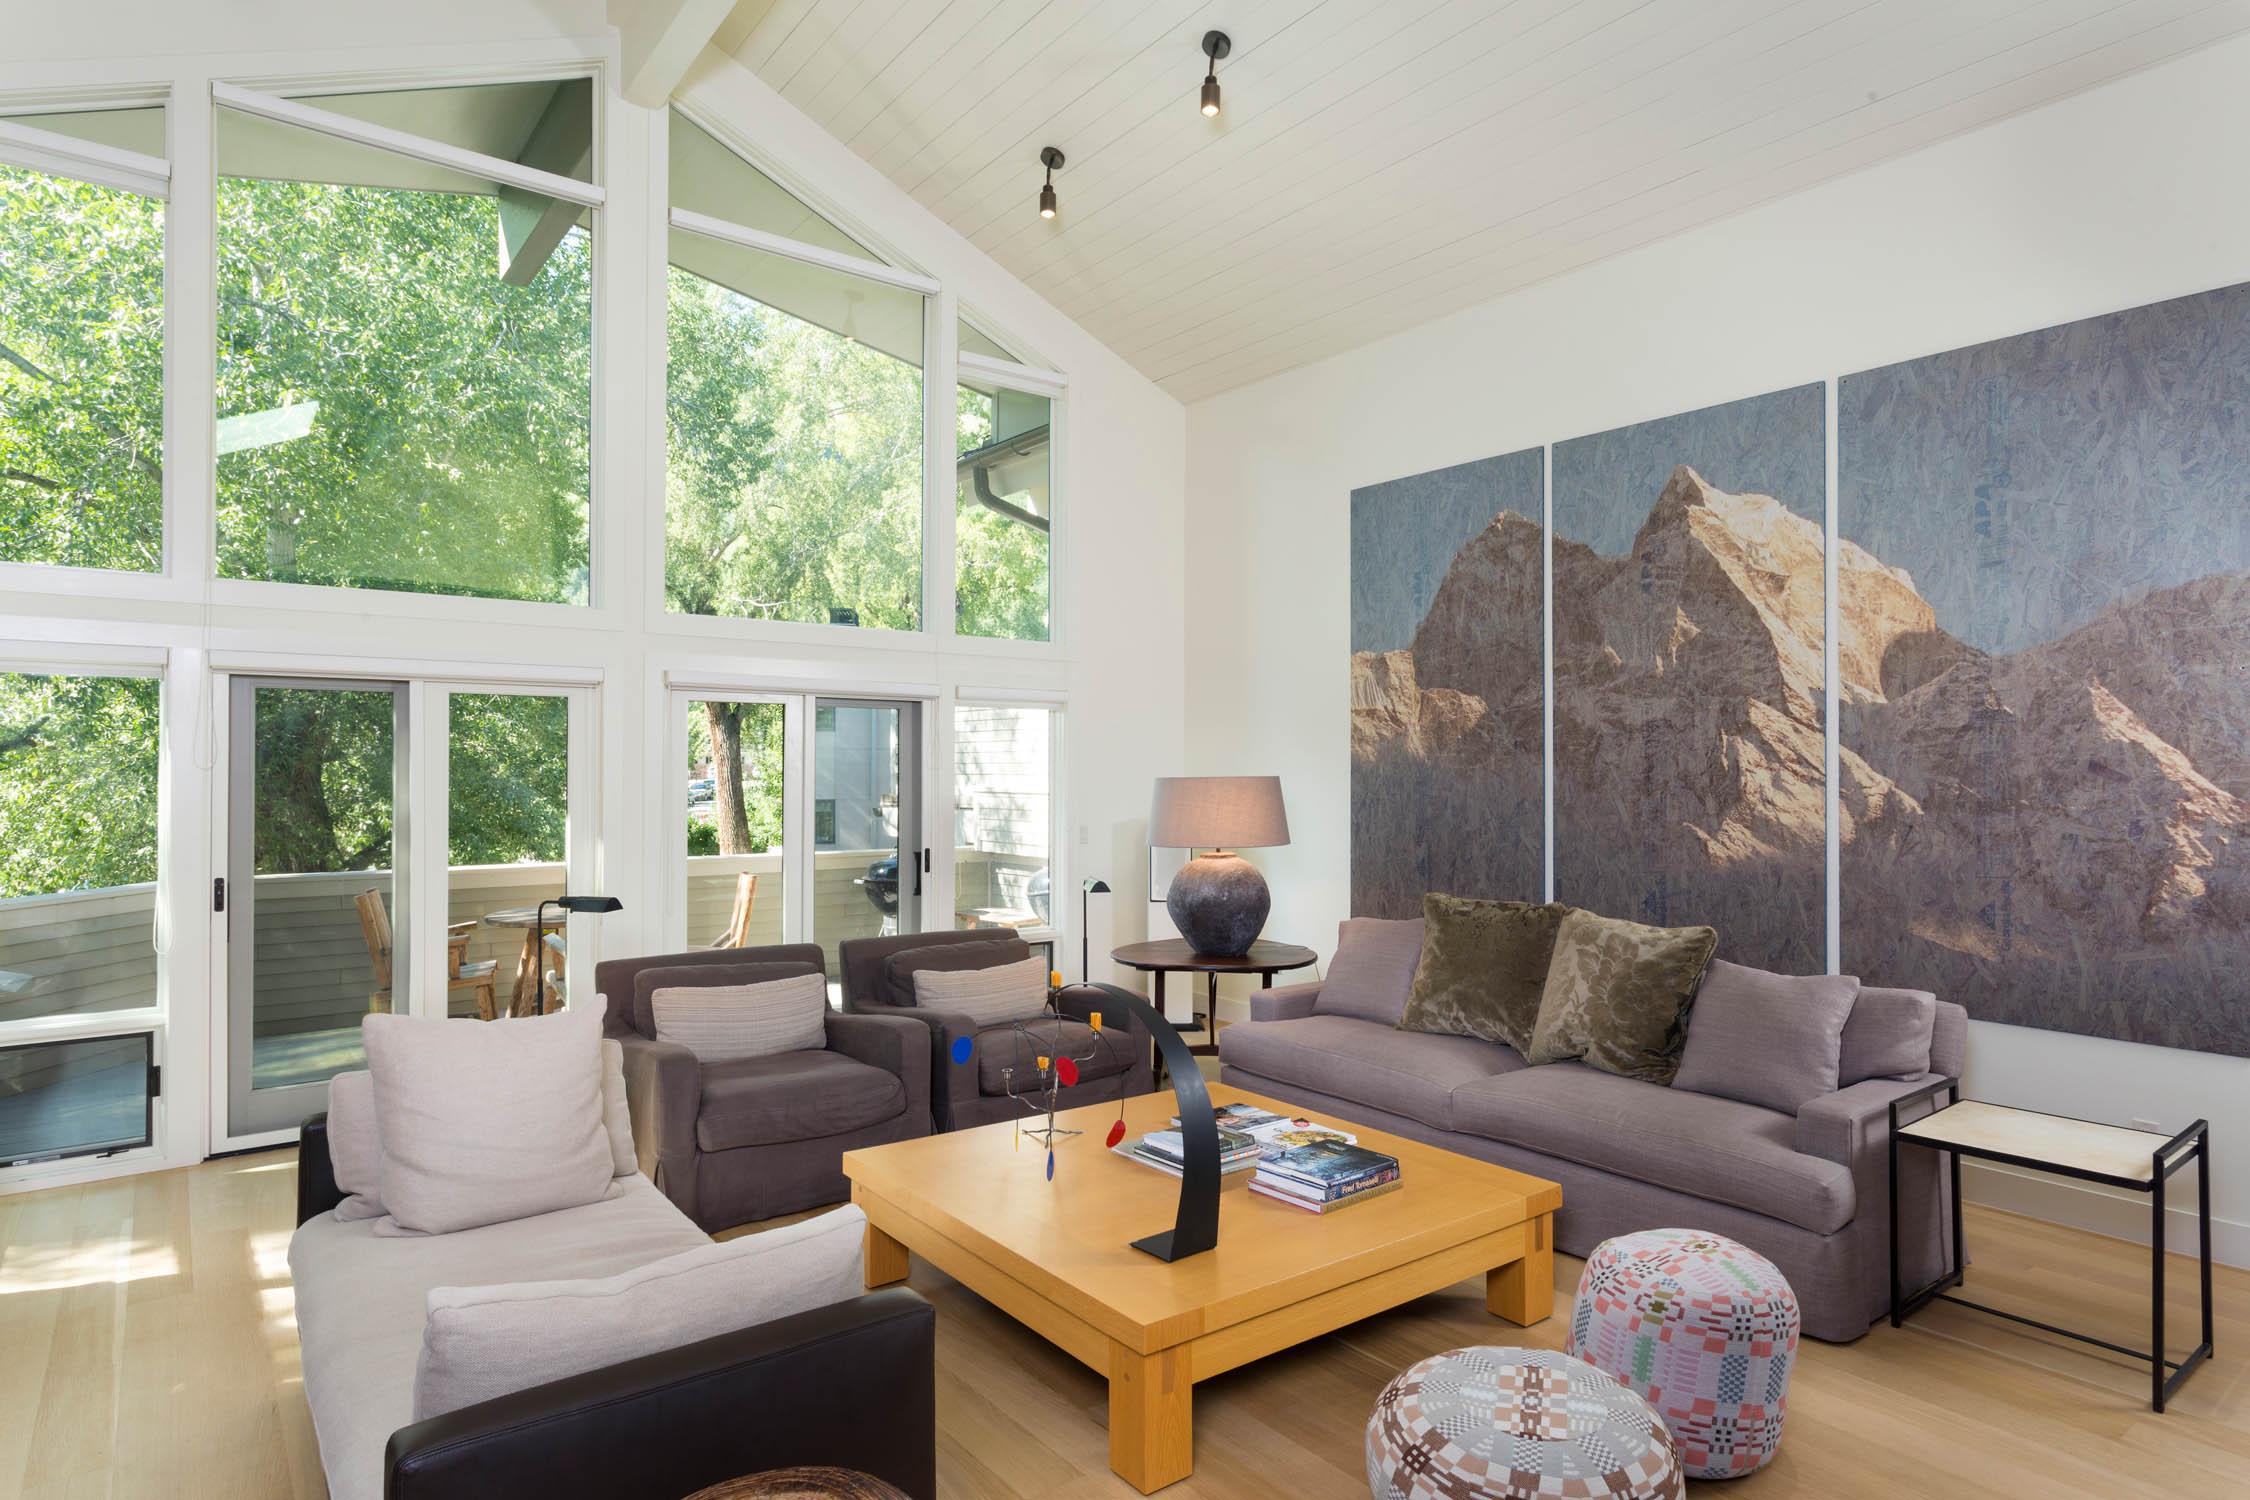 Aspen private home rentals